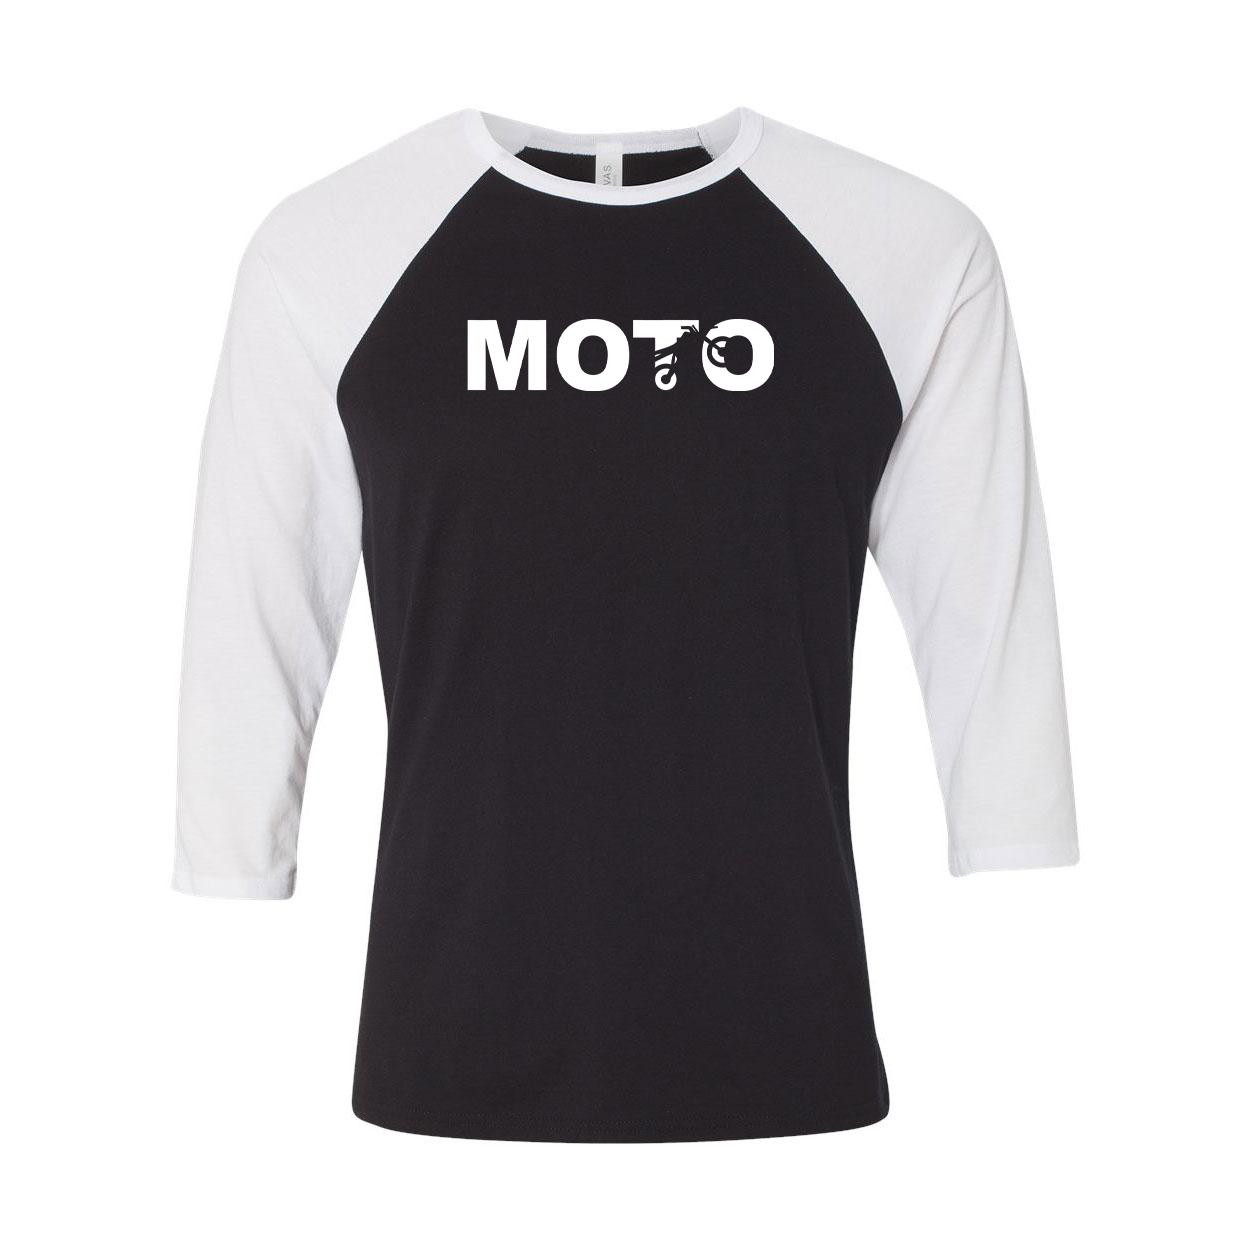 Moto Wheelie Logo Classic Raglan Shirt Black/White (White Logo)